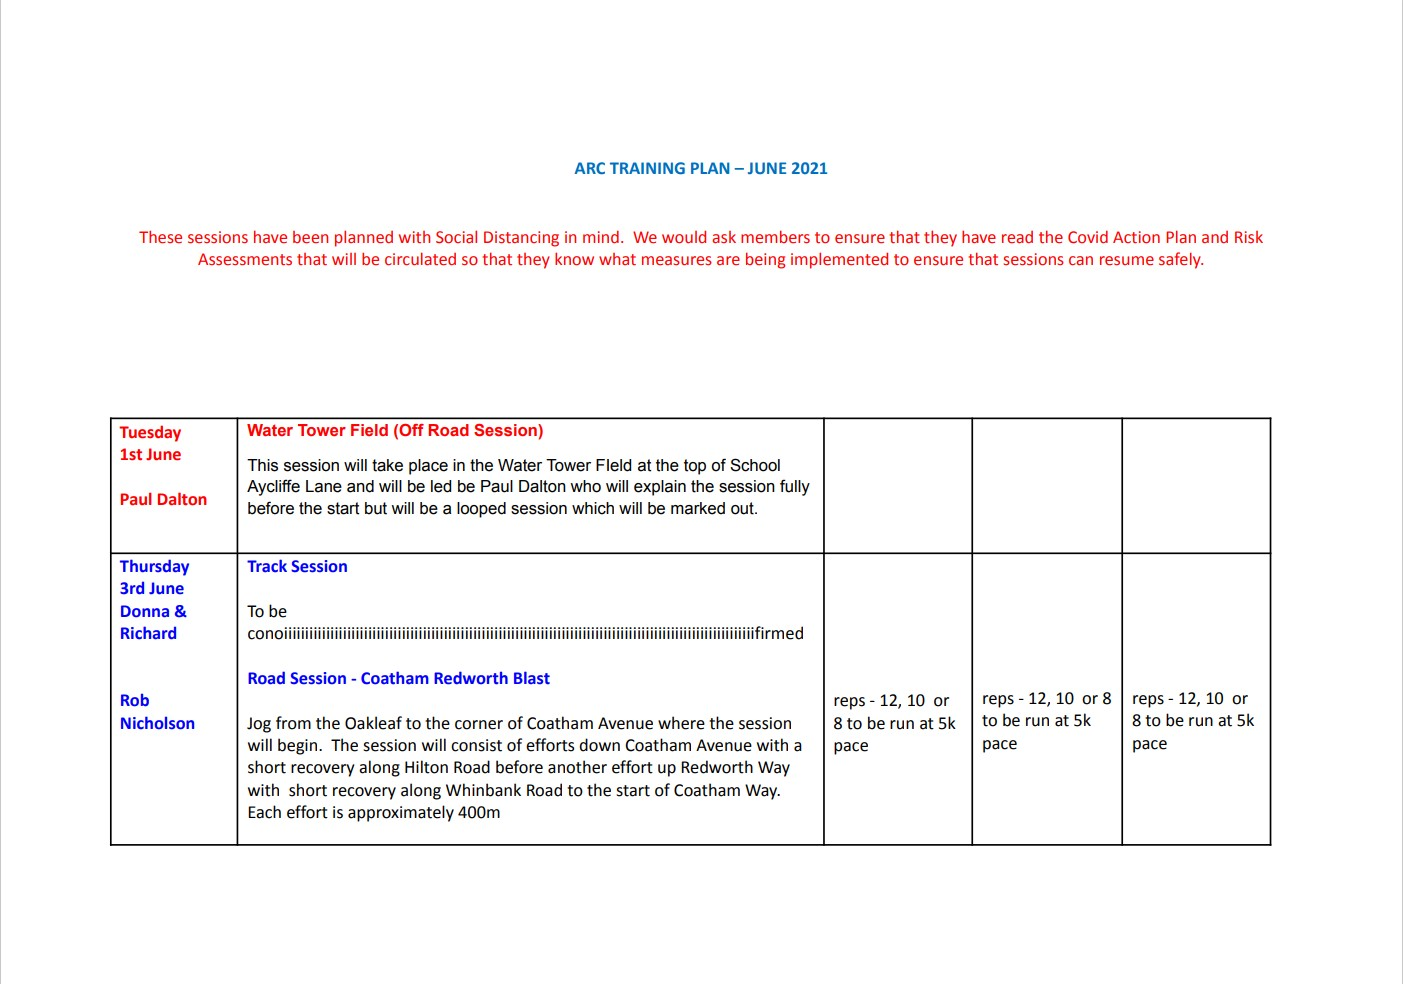 ARC Training Plan June 2021 a